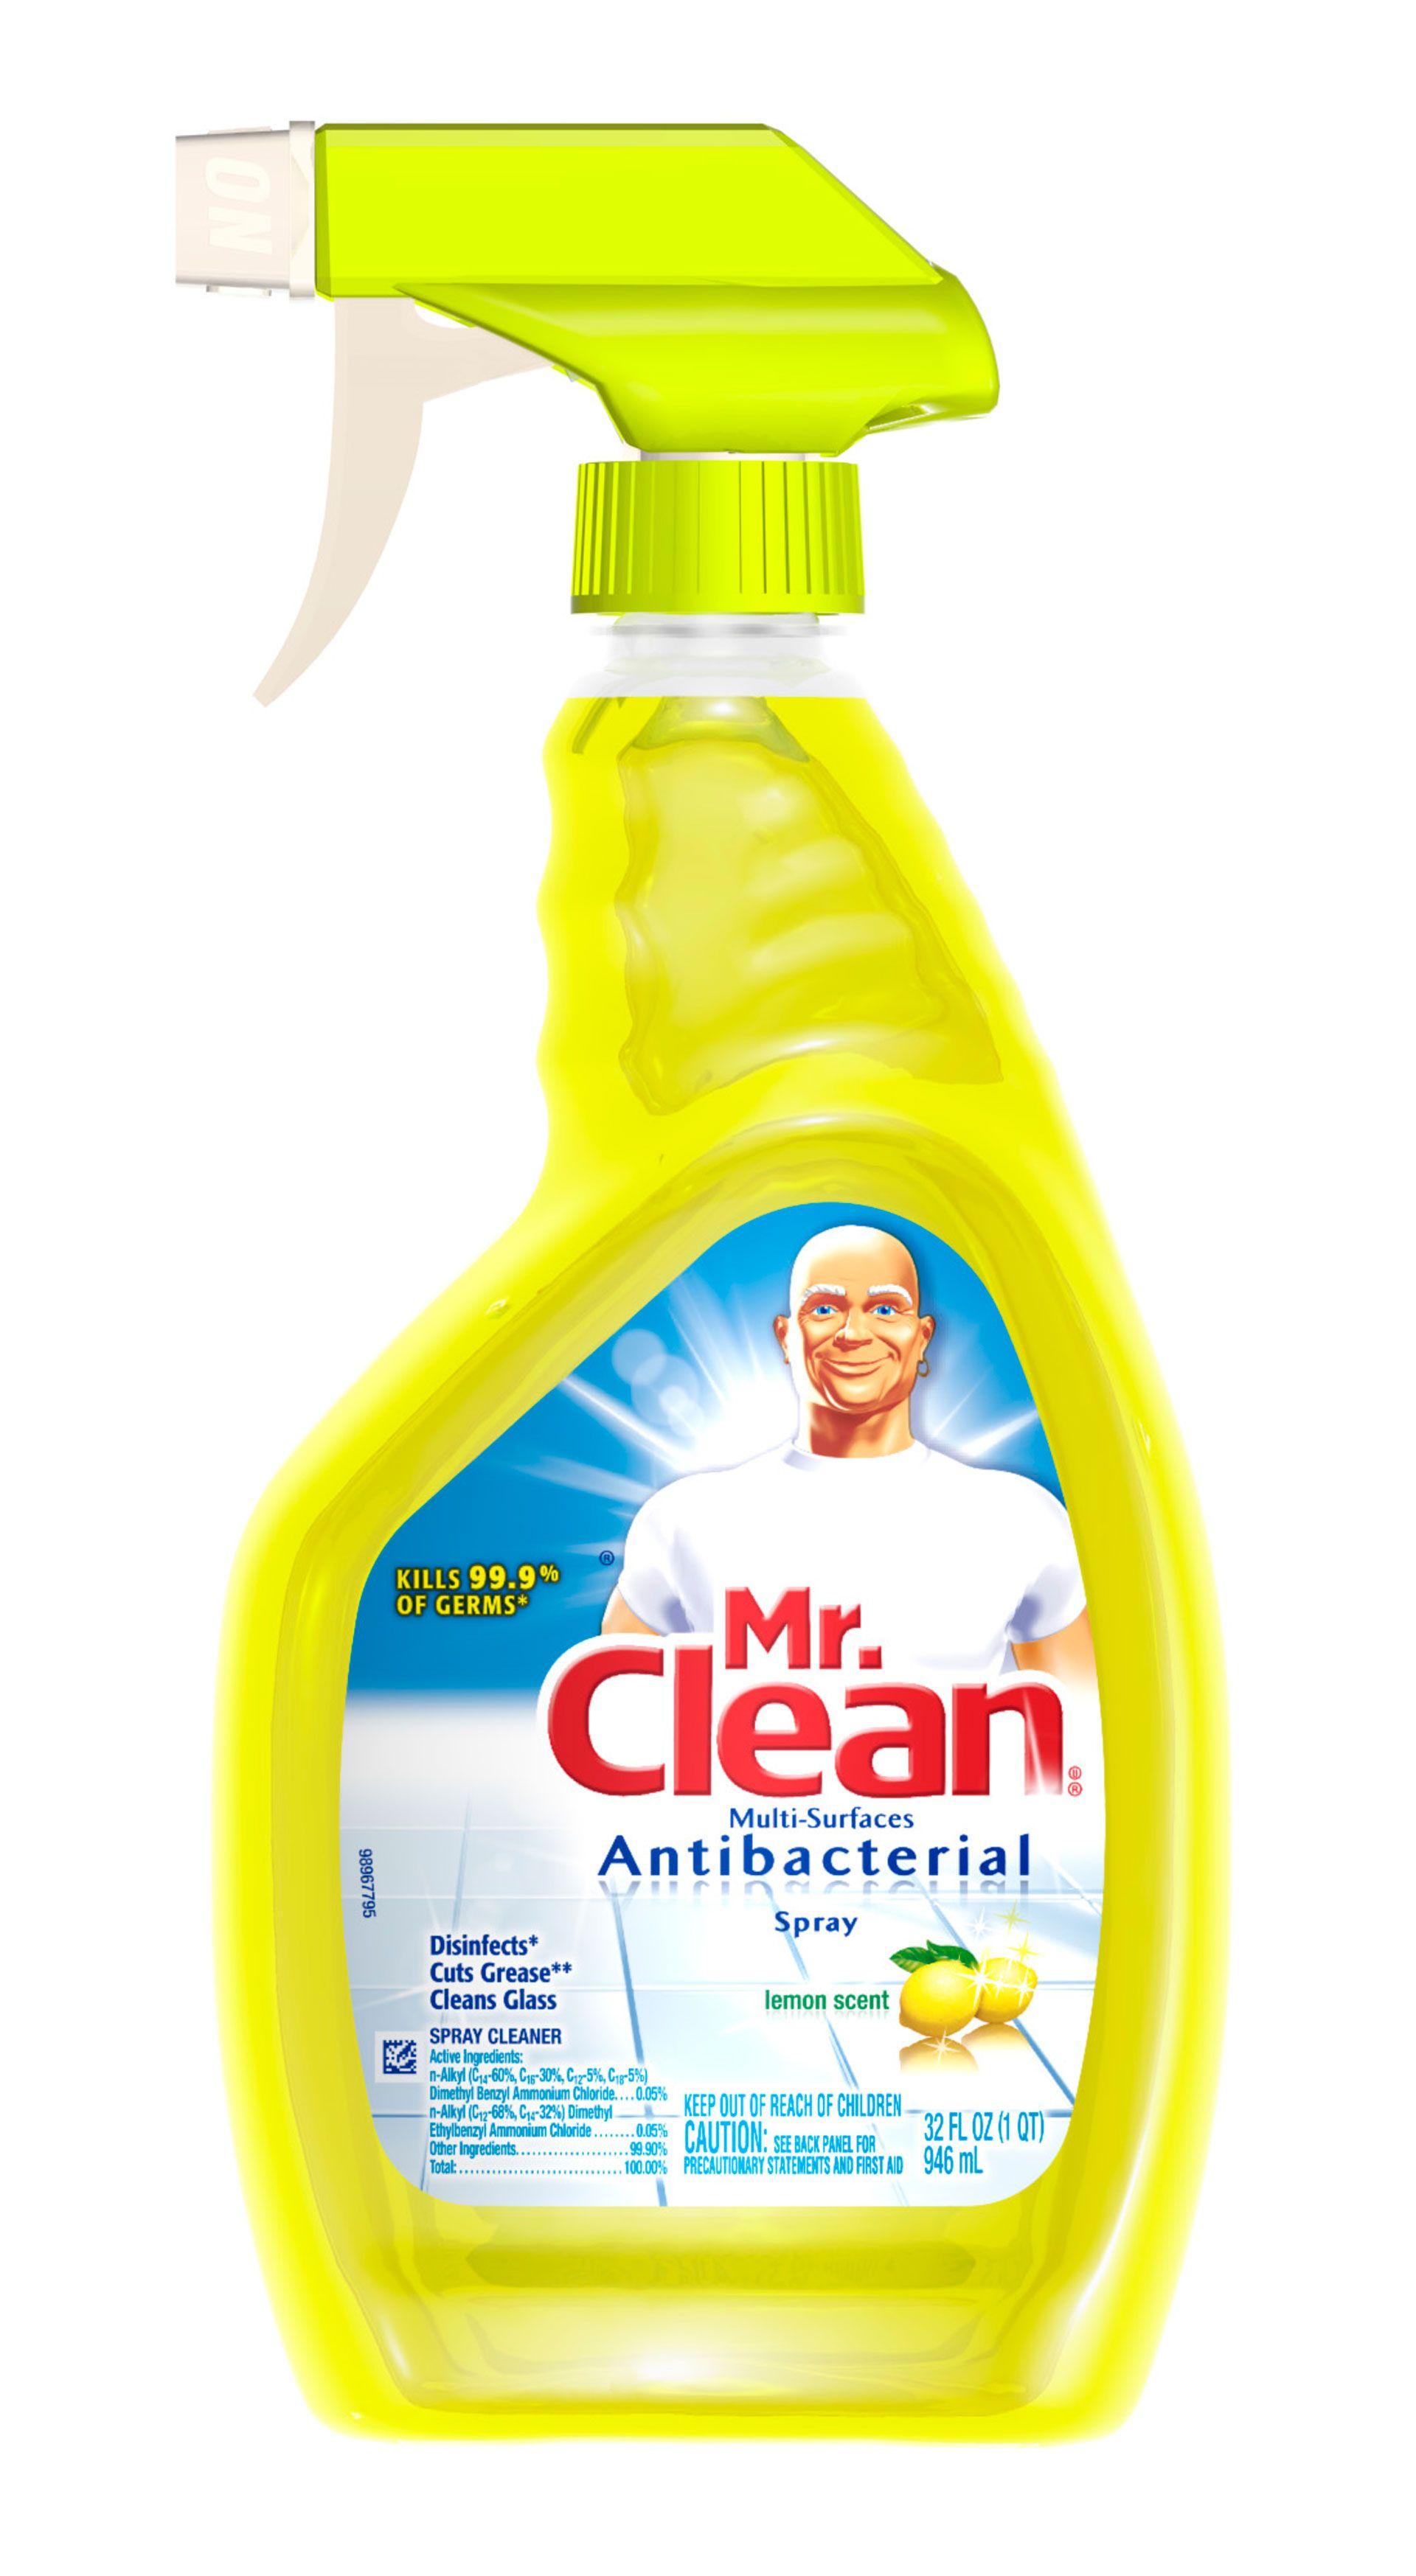 Stellar Multi Purpose Cleaners Multipurpose Cleaner Antibacterial Spray Antibacterial Cleaner